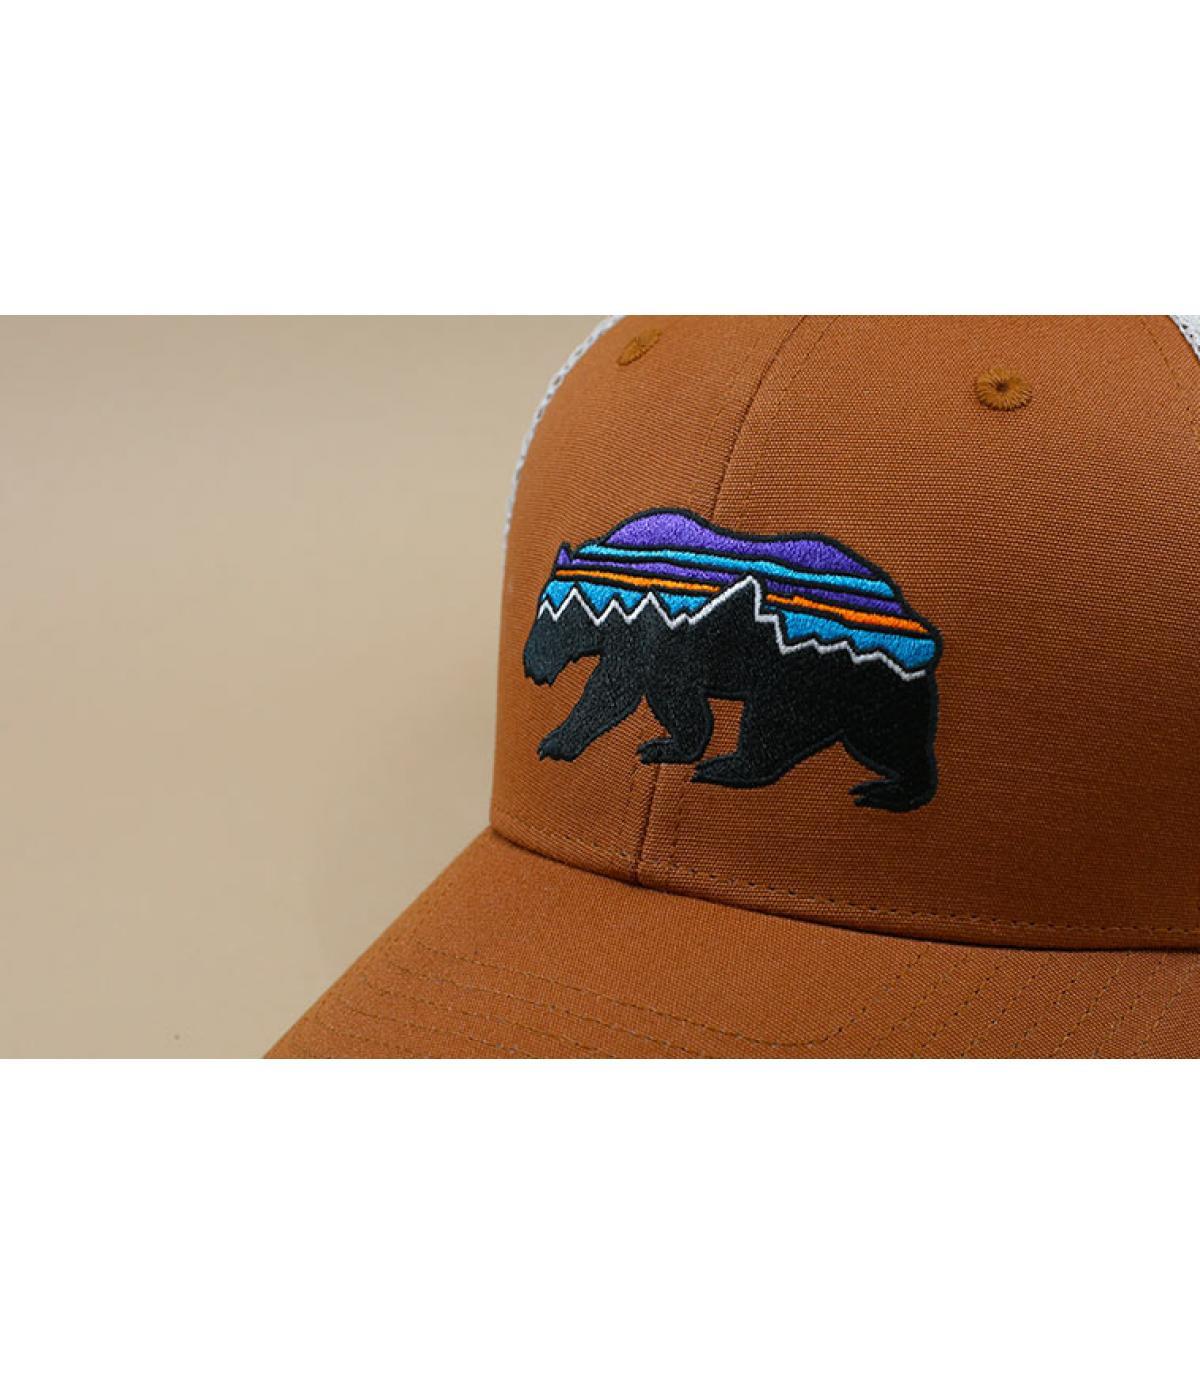 Détails Fitz Roy Bear Trucker earthworm brown - image 3